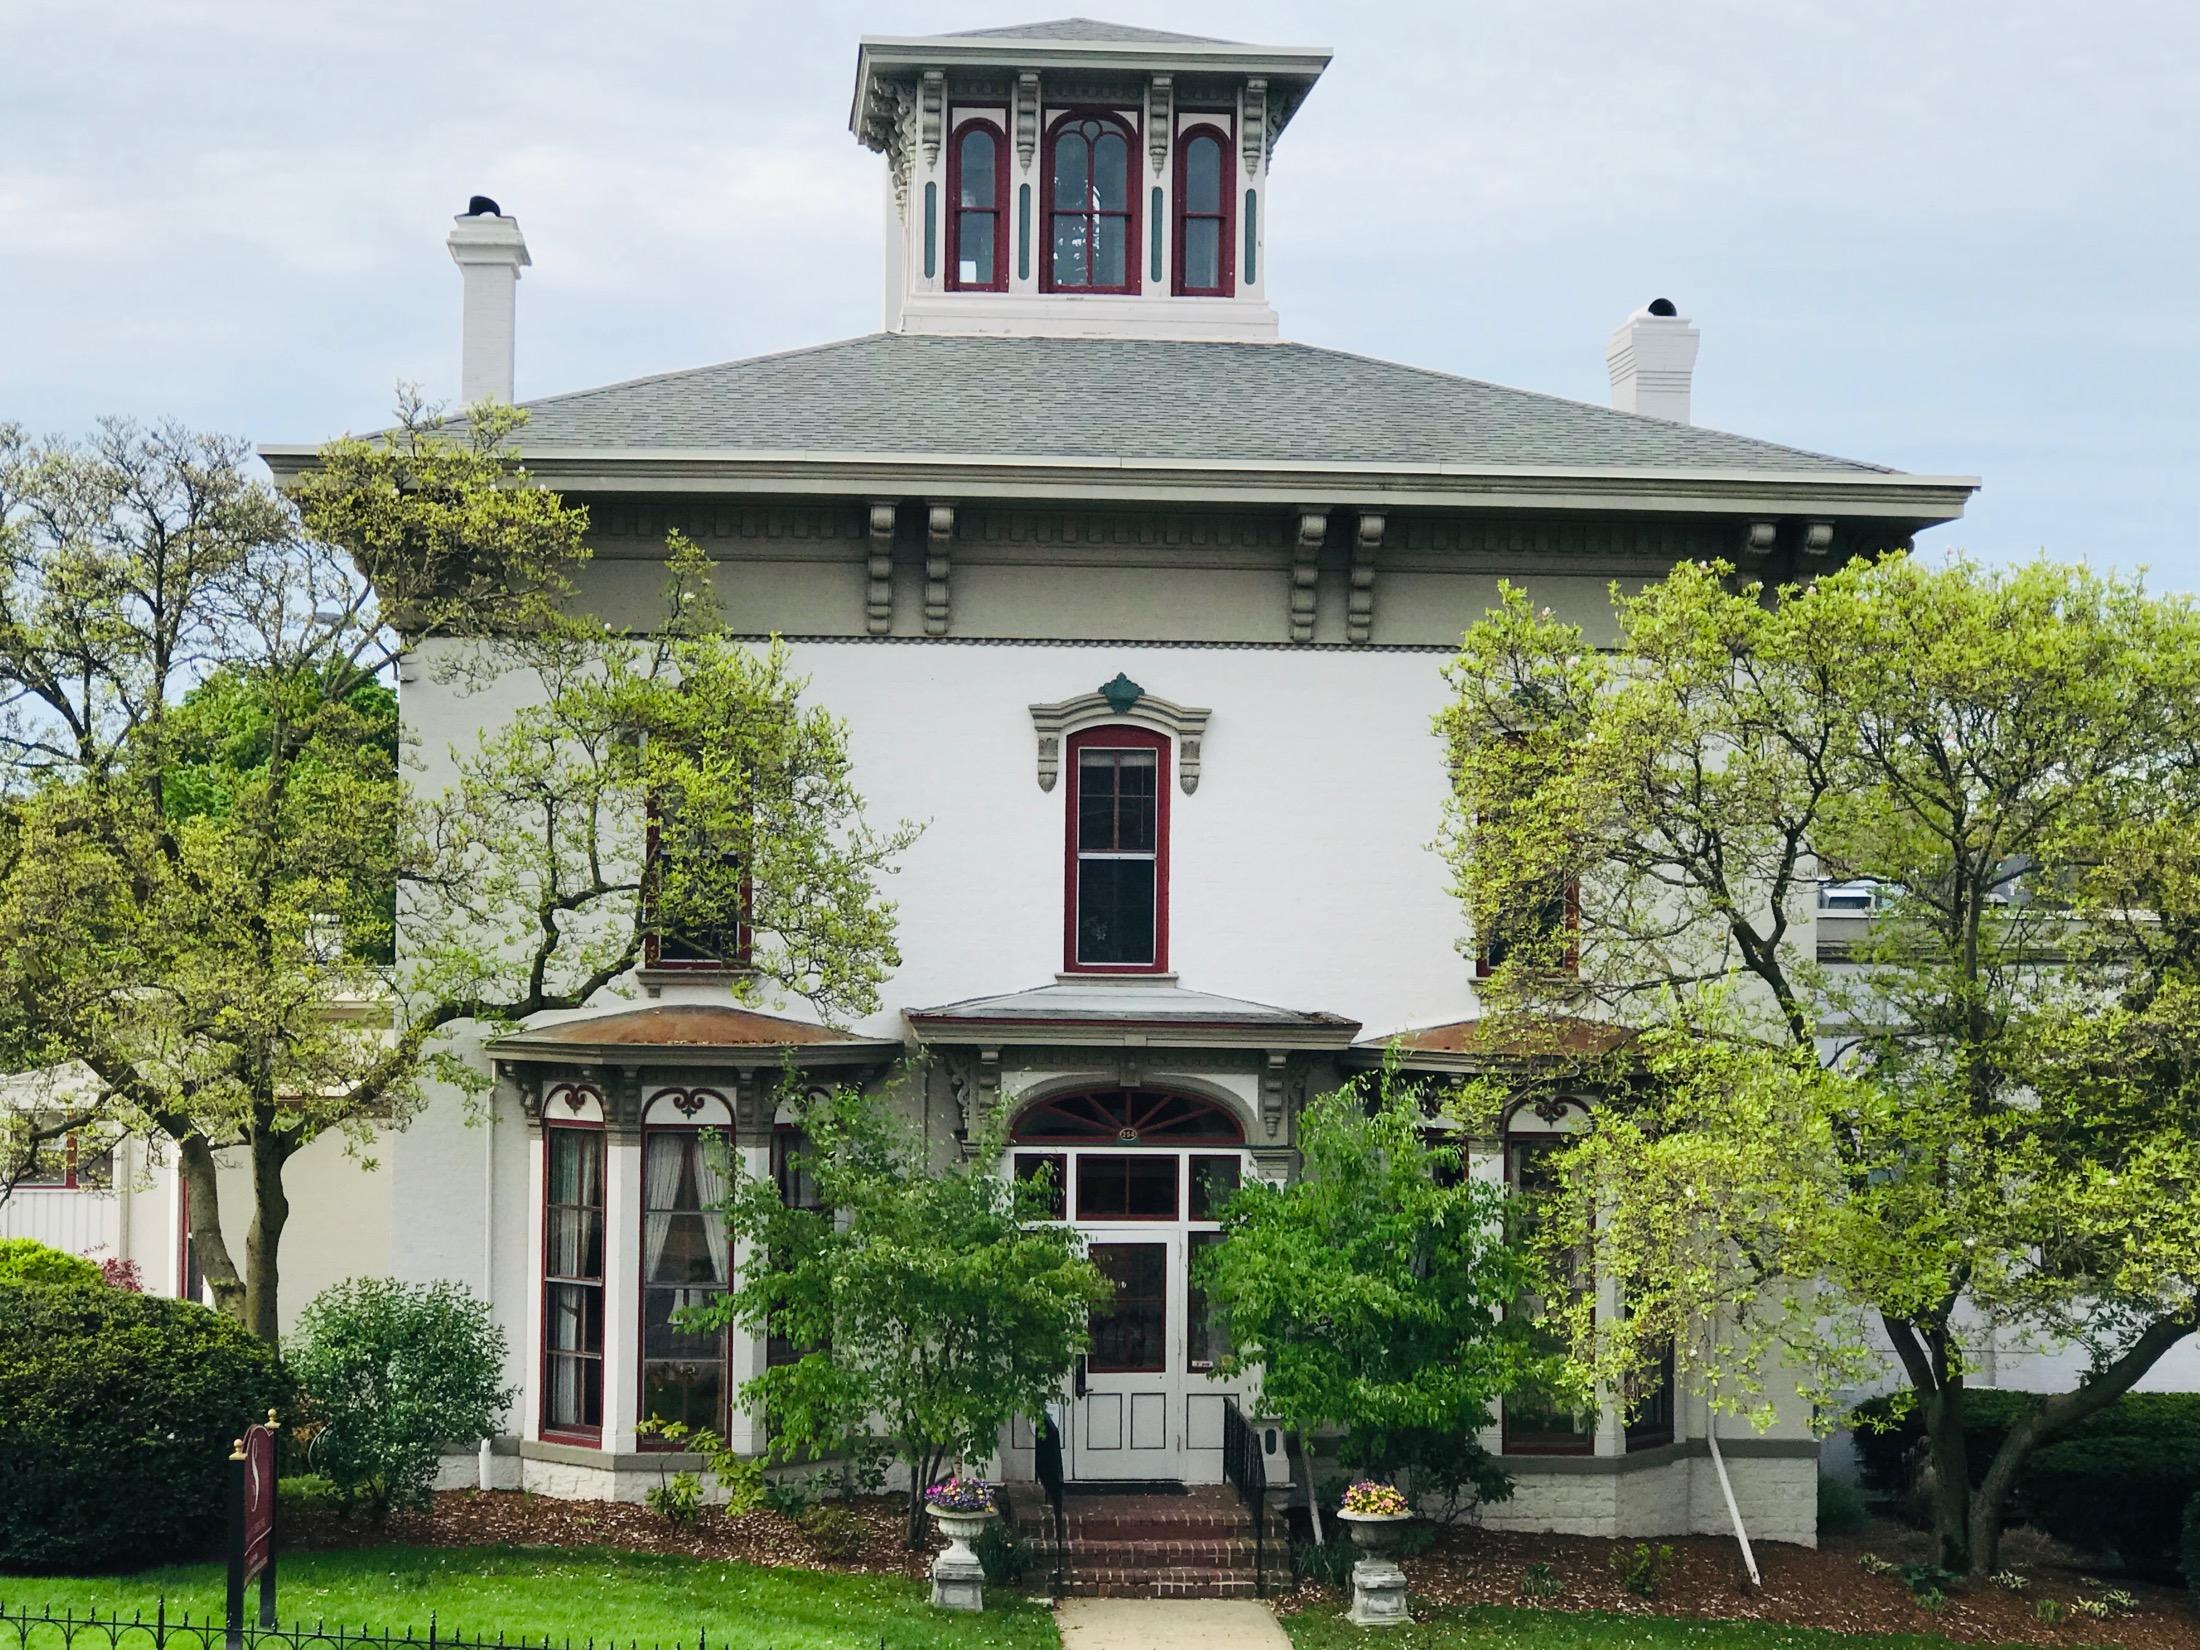 MARTIN SWEET HOUSE